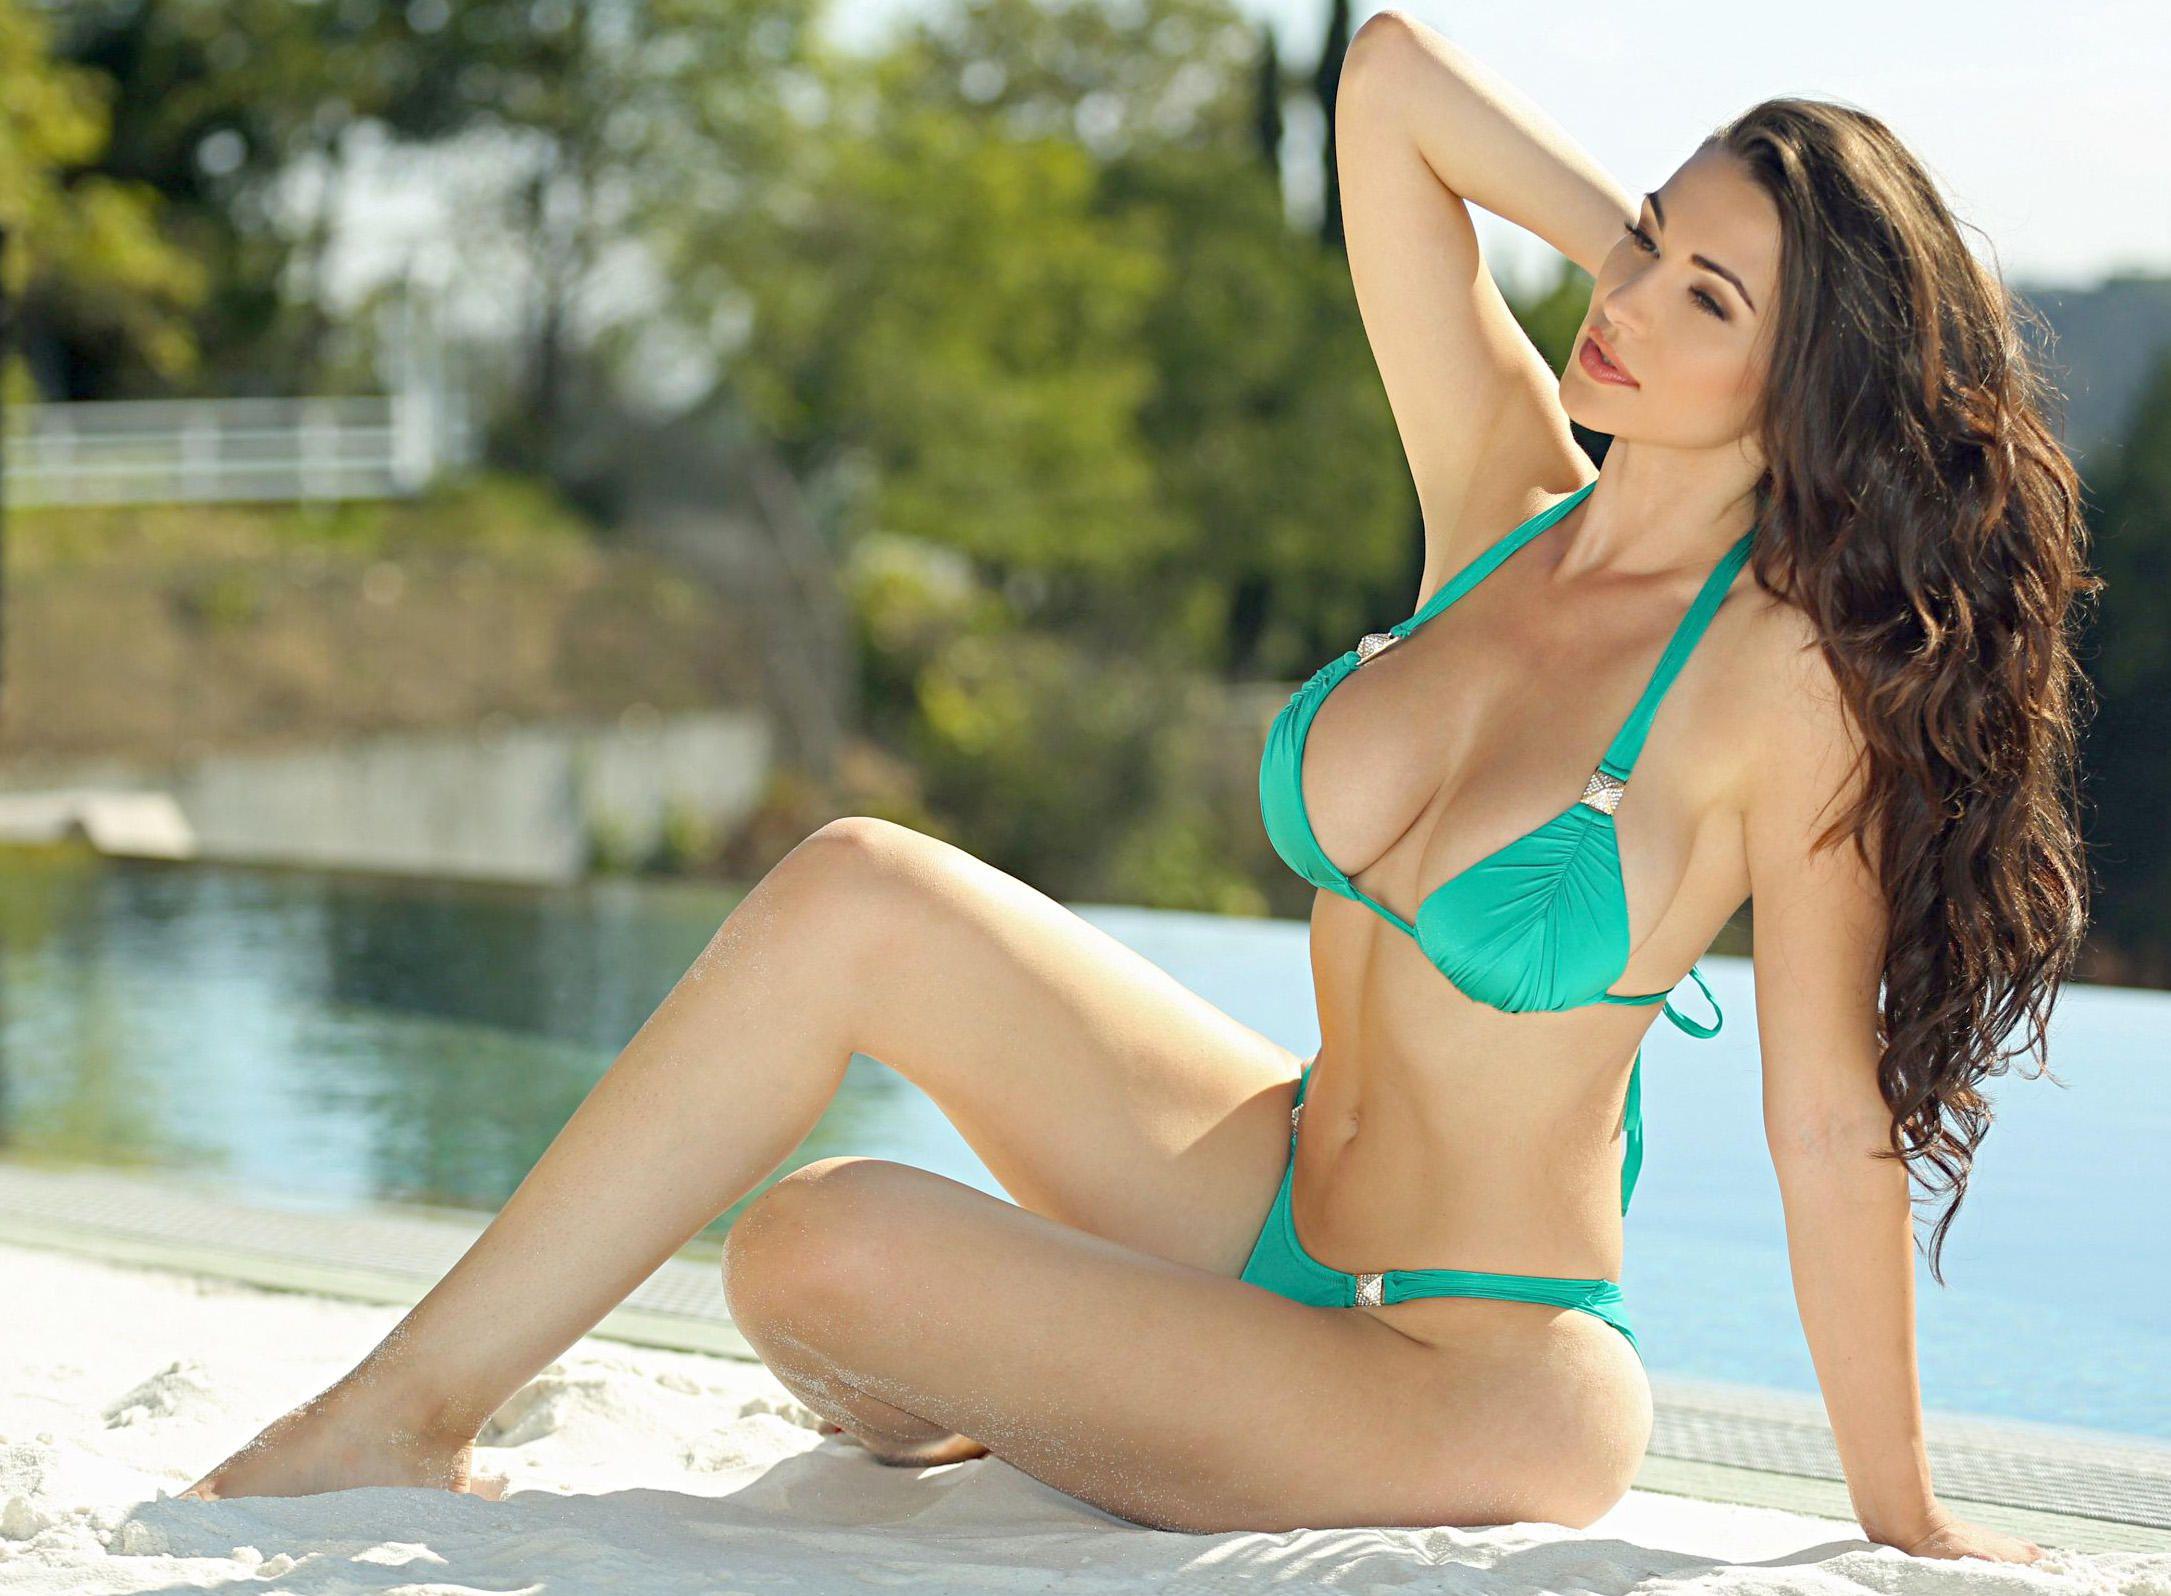 Sara Jean Underwood Sexy (5 Photos) - Yolo Celebs